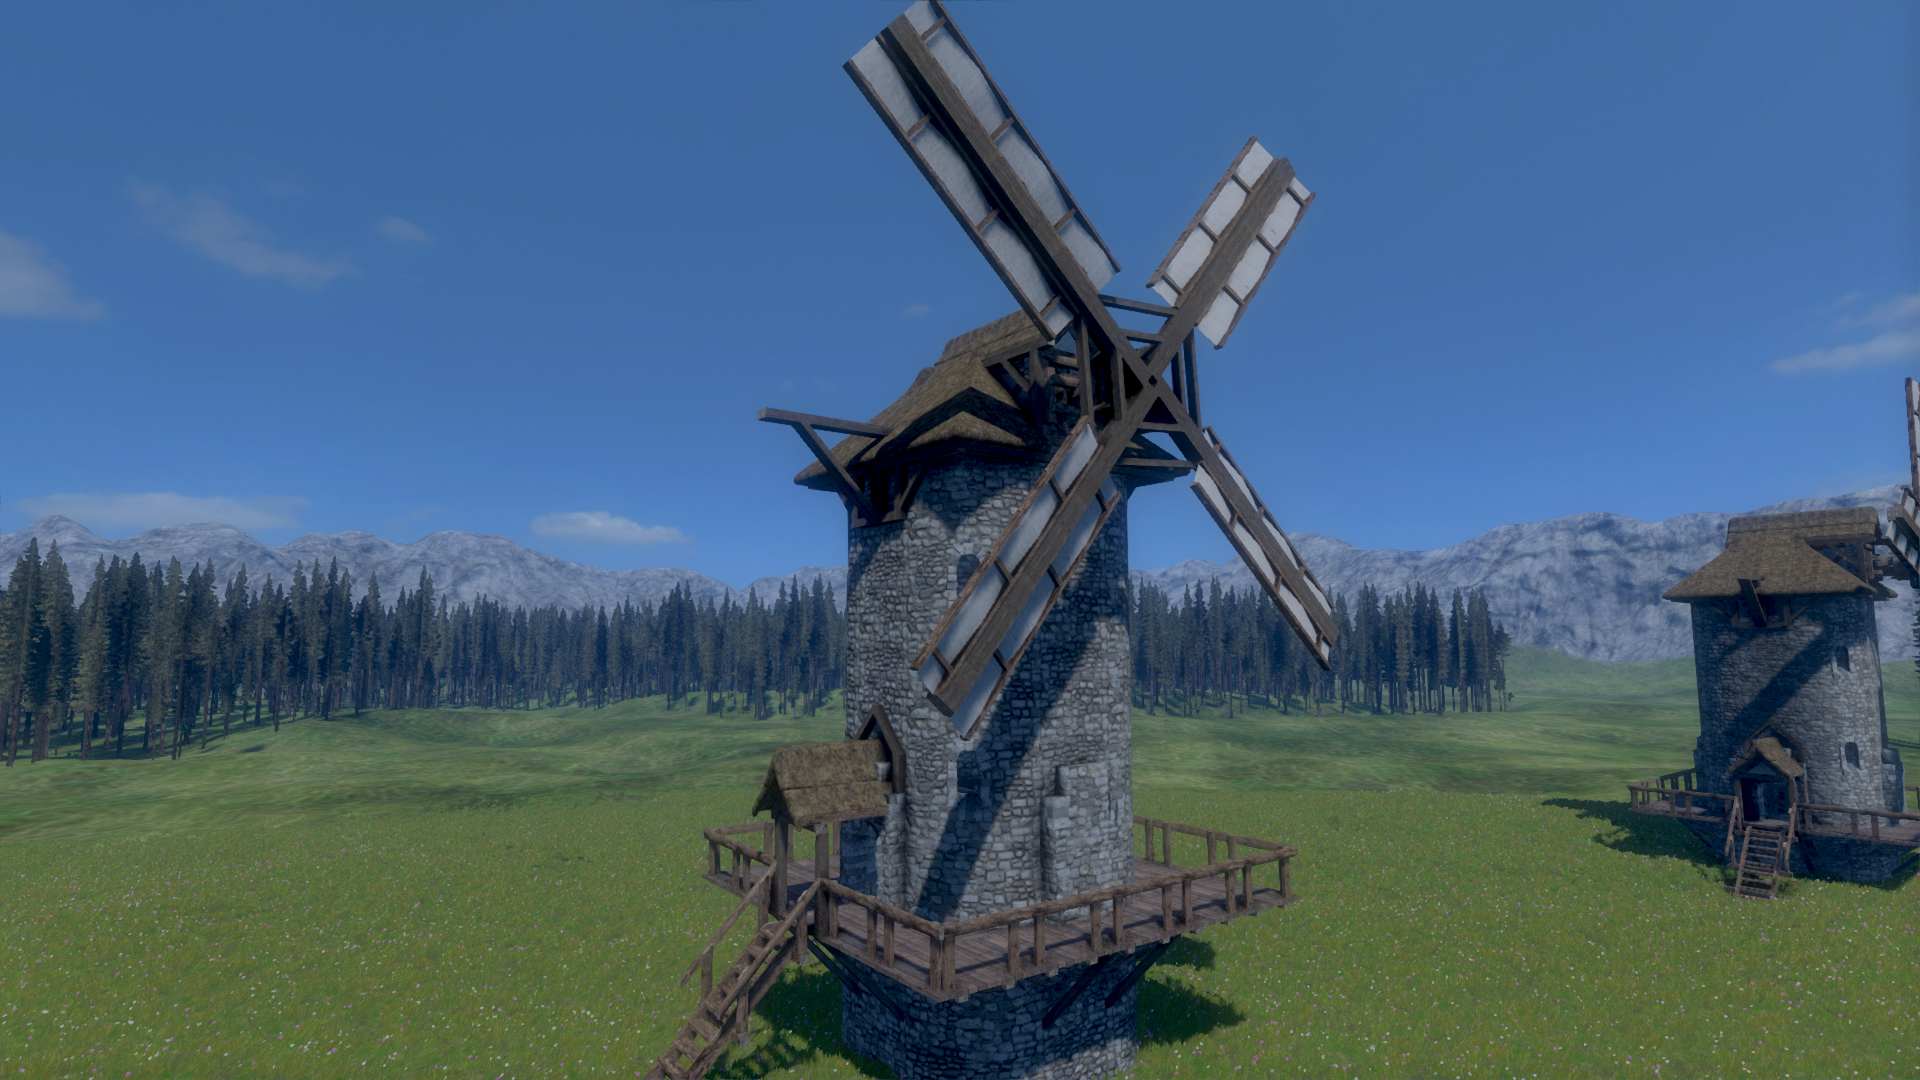 Windmill with Mechanics | Keen Software House Forums